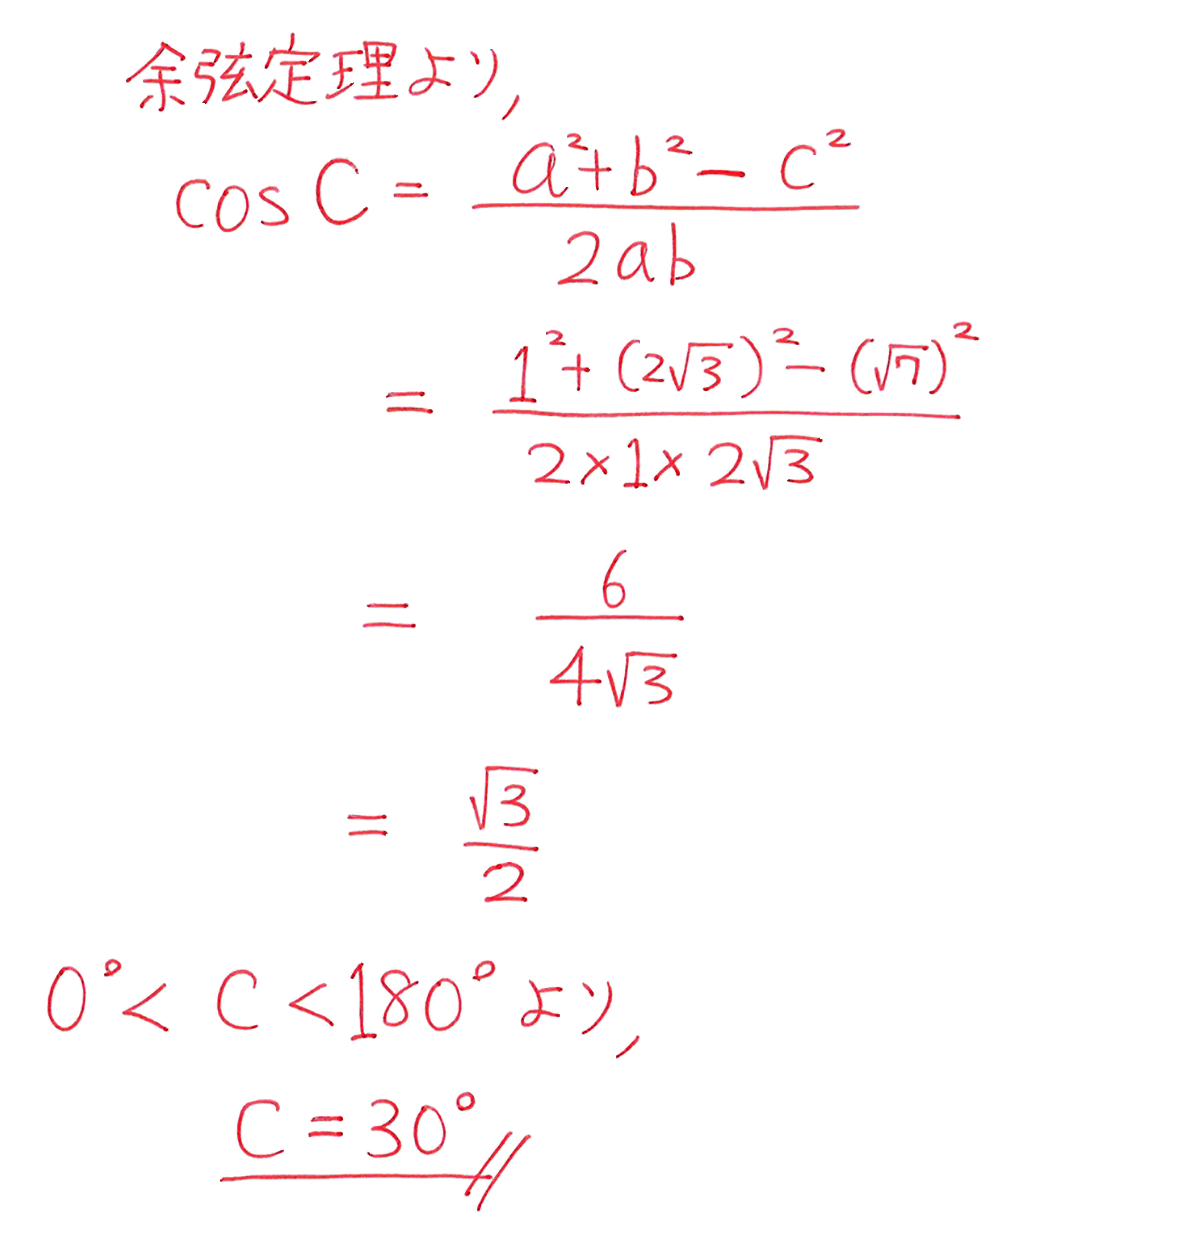 高校数学Ⅰ 三角比23 練習の答え